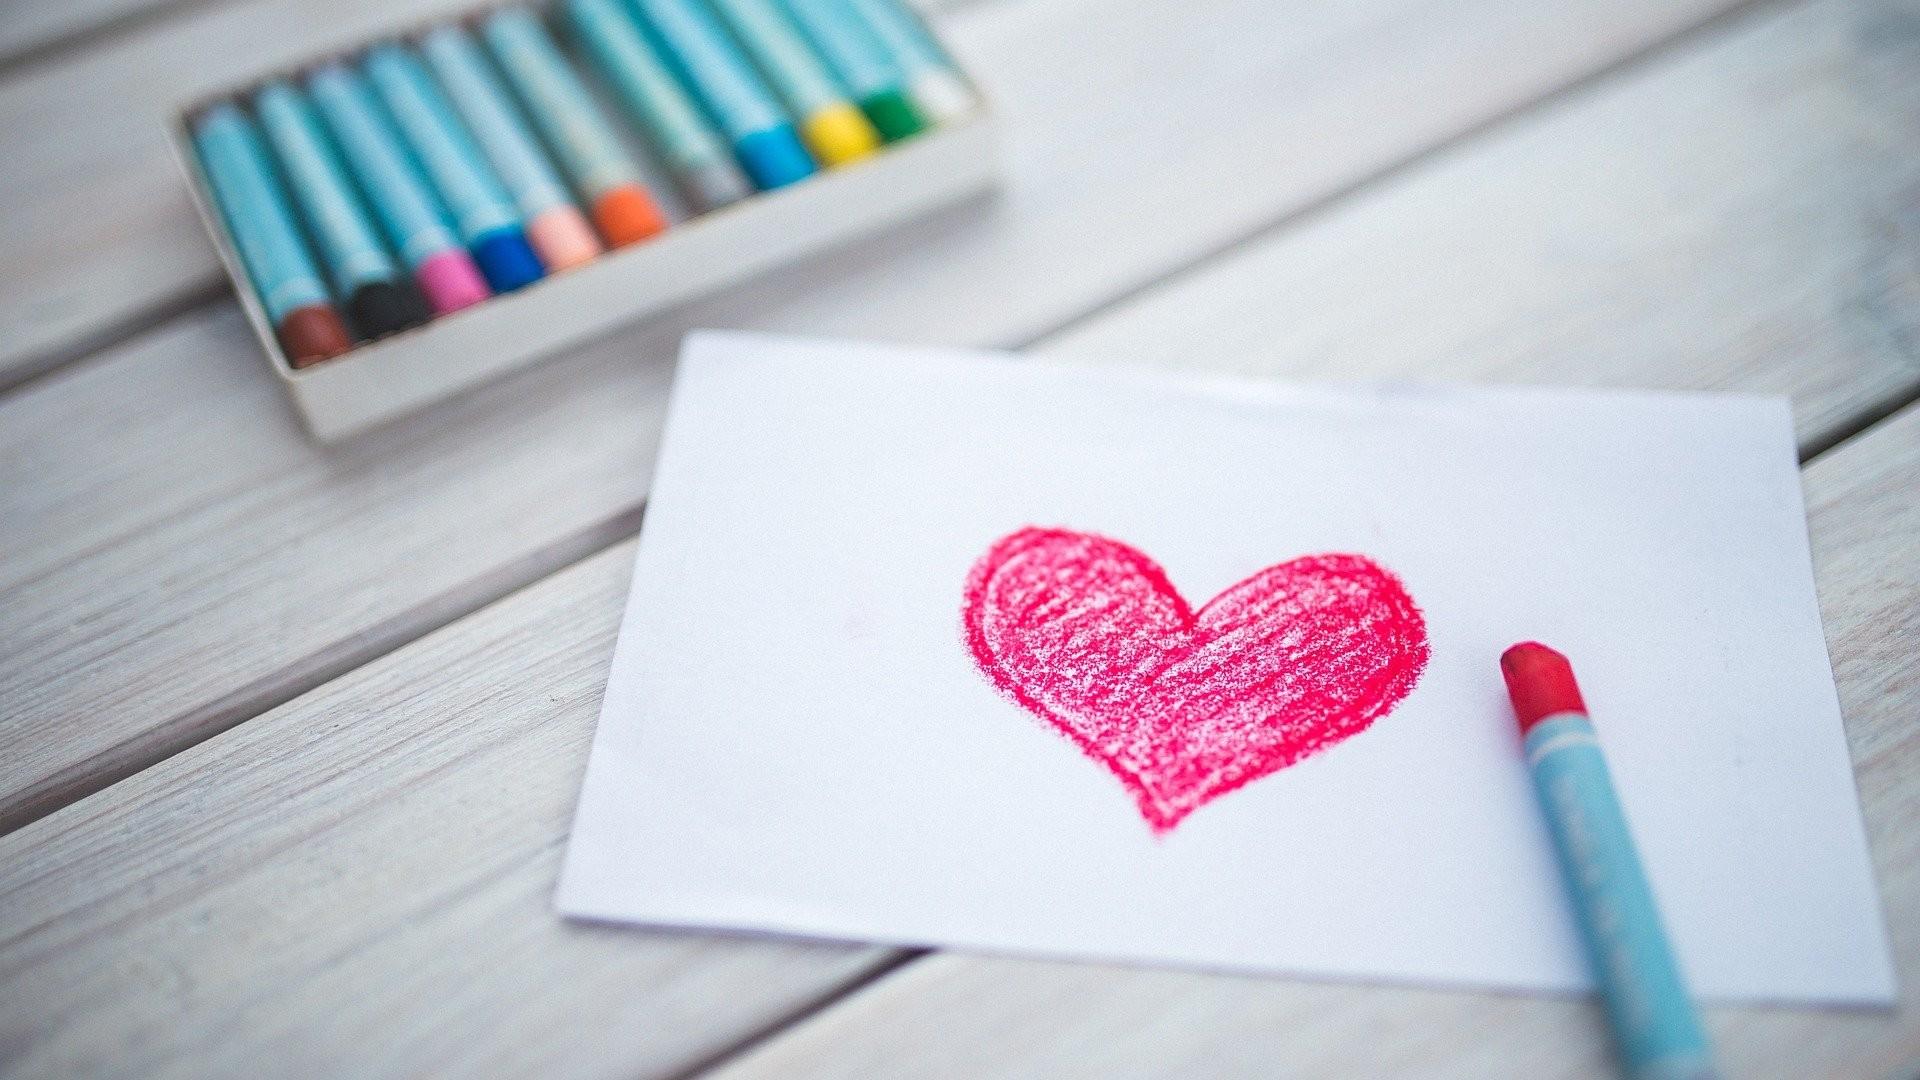 Jatuh Cinta Di Pandangan Pertama